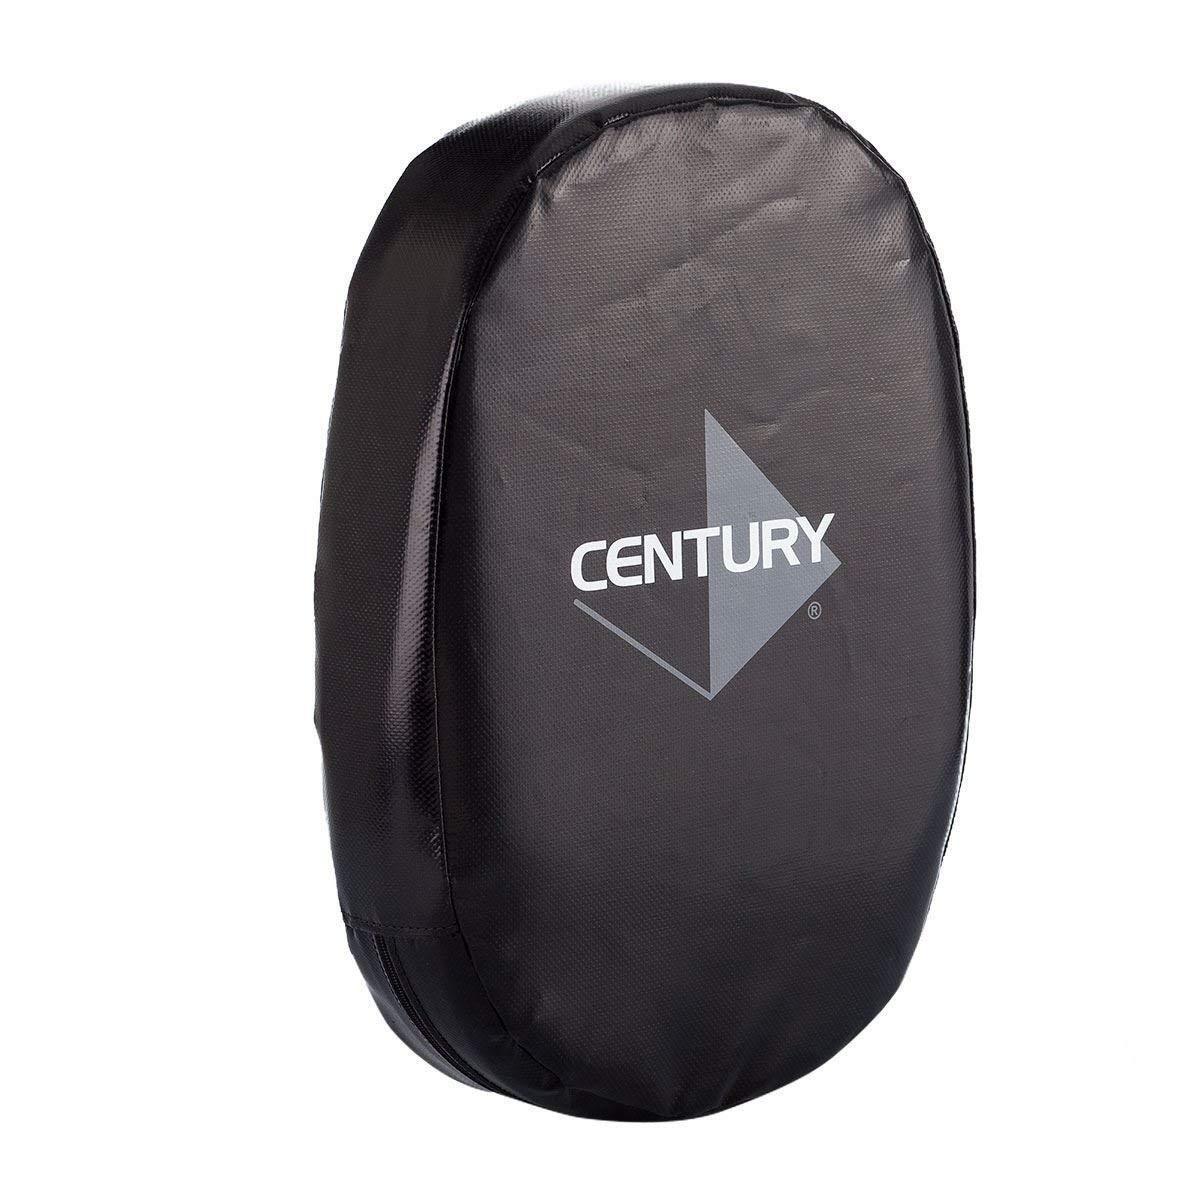 Century Hand Held Oval Martial Arts Training Target - C1023